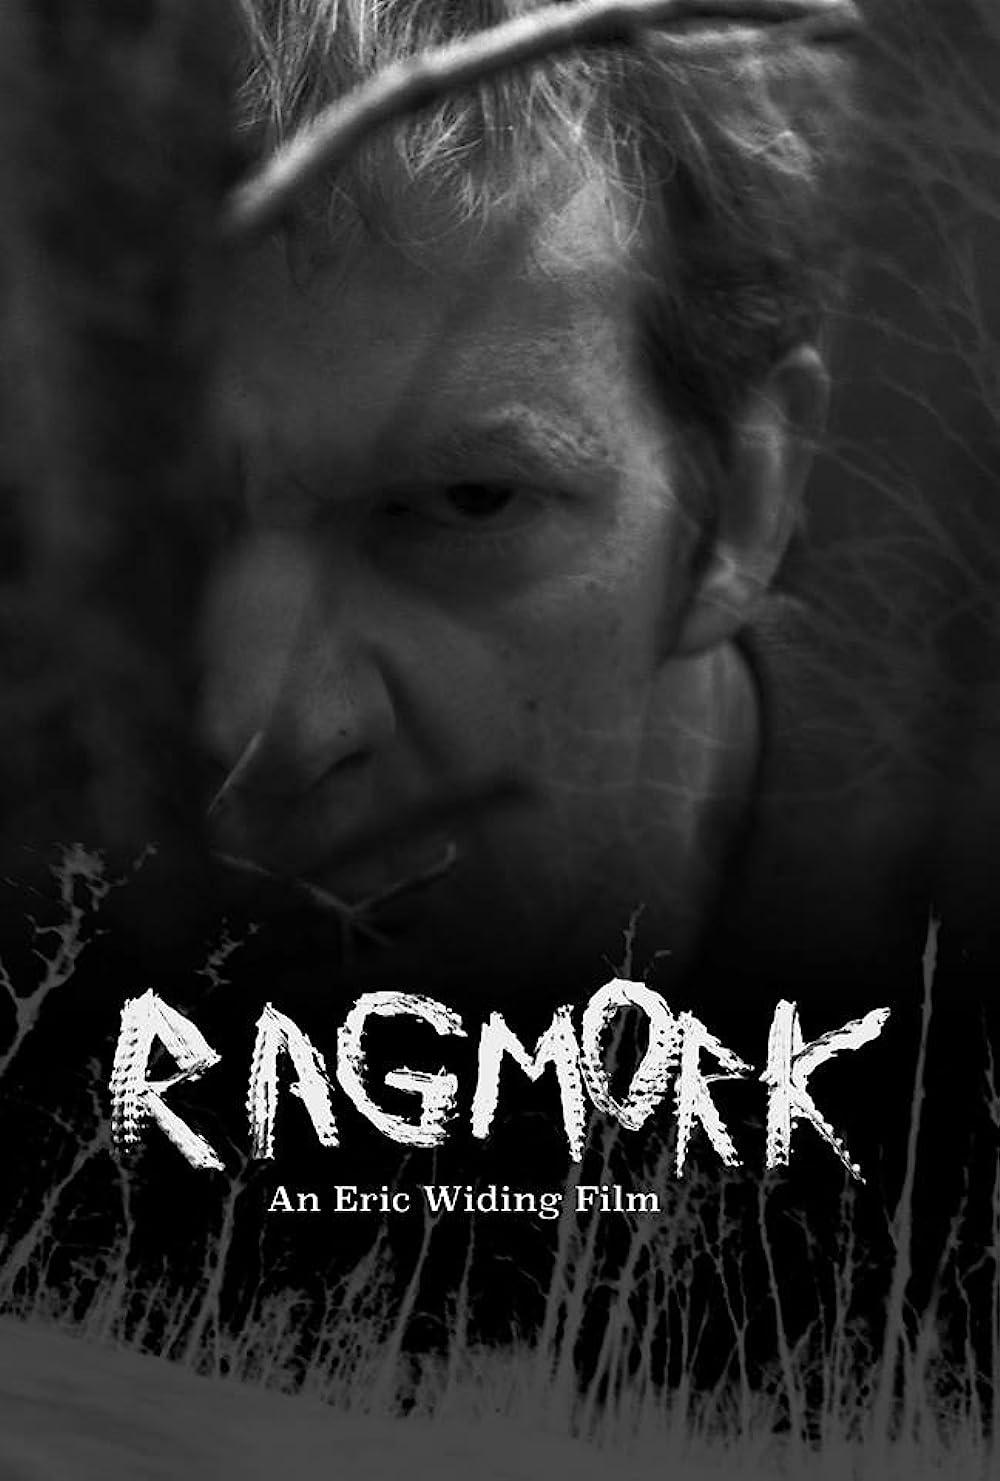 Download Ragmork (2019) WebRip 720p Full Movie [In English] With Hindi Subtitles Full Movie Online On 1xcinema.com